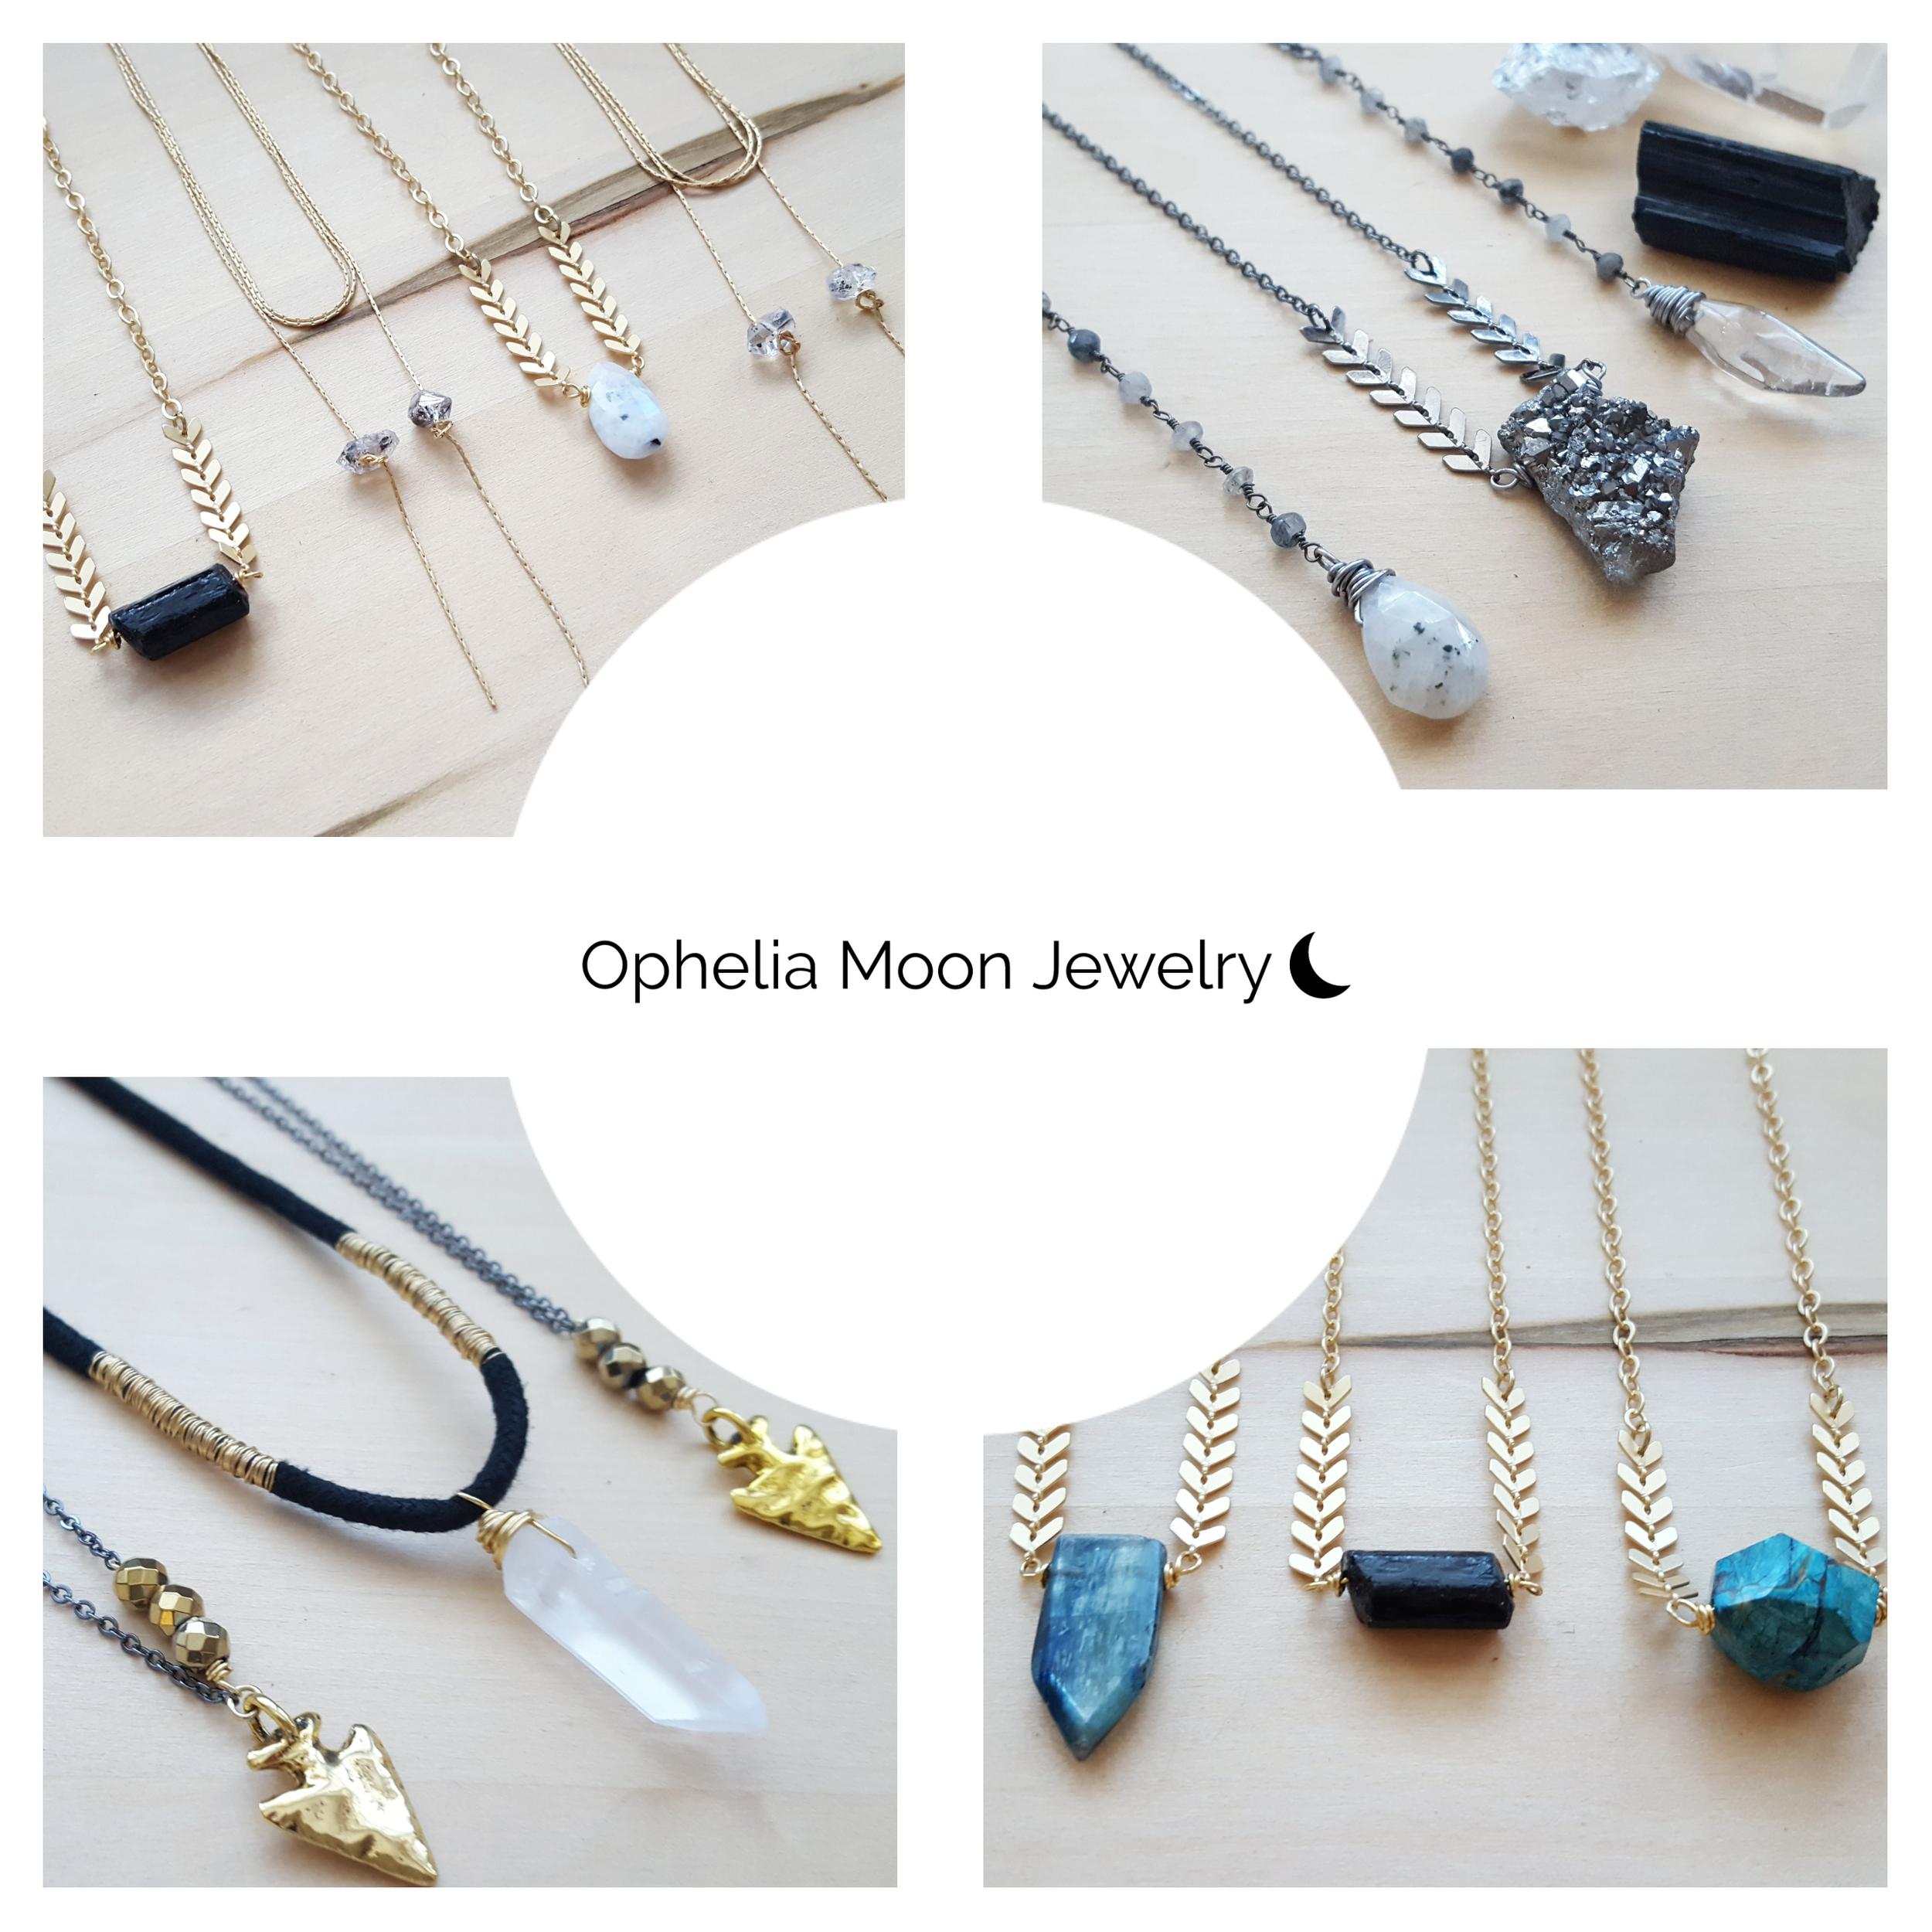 ophelia moon jewelry - handcrafted jewelry saturday